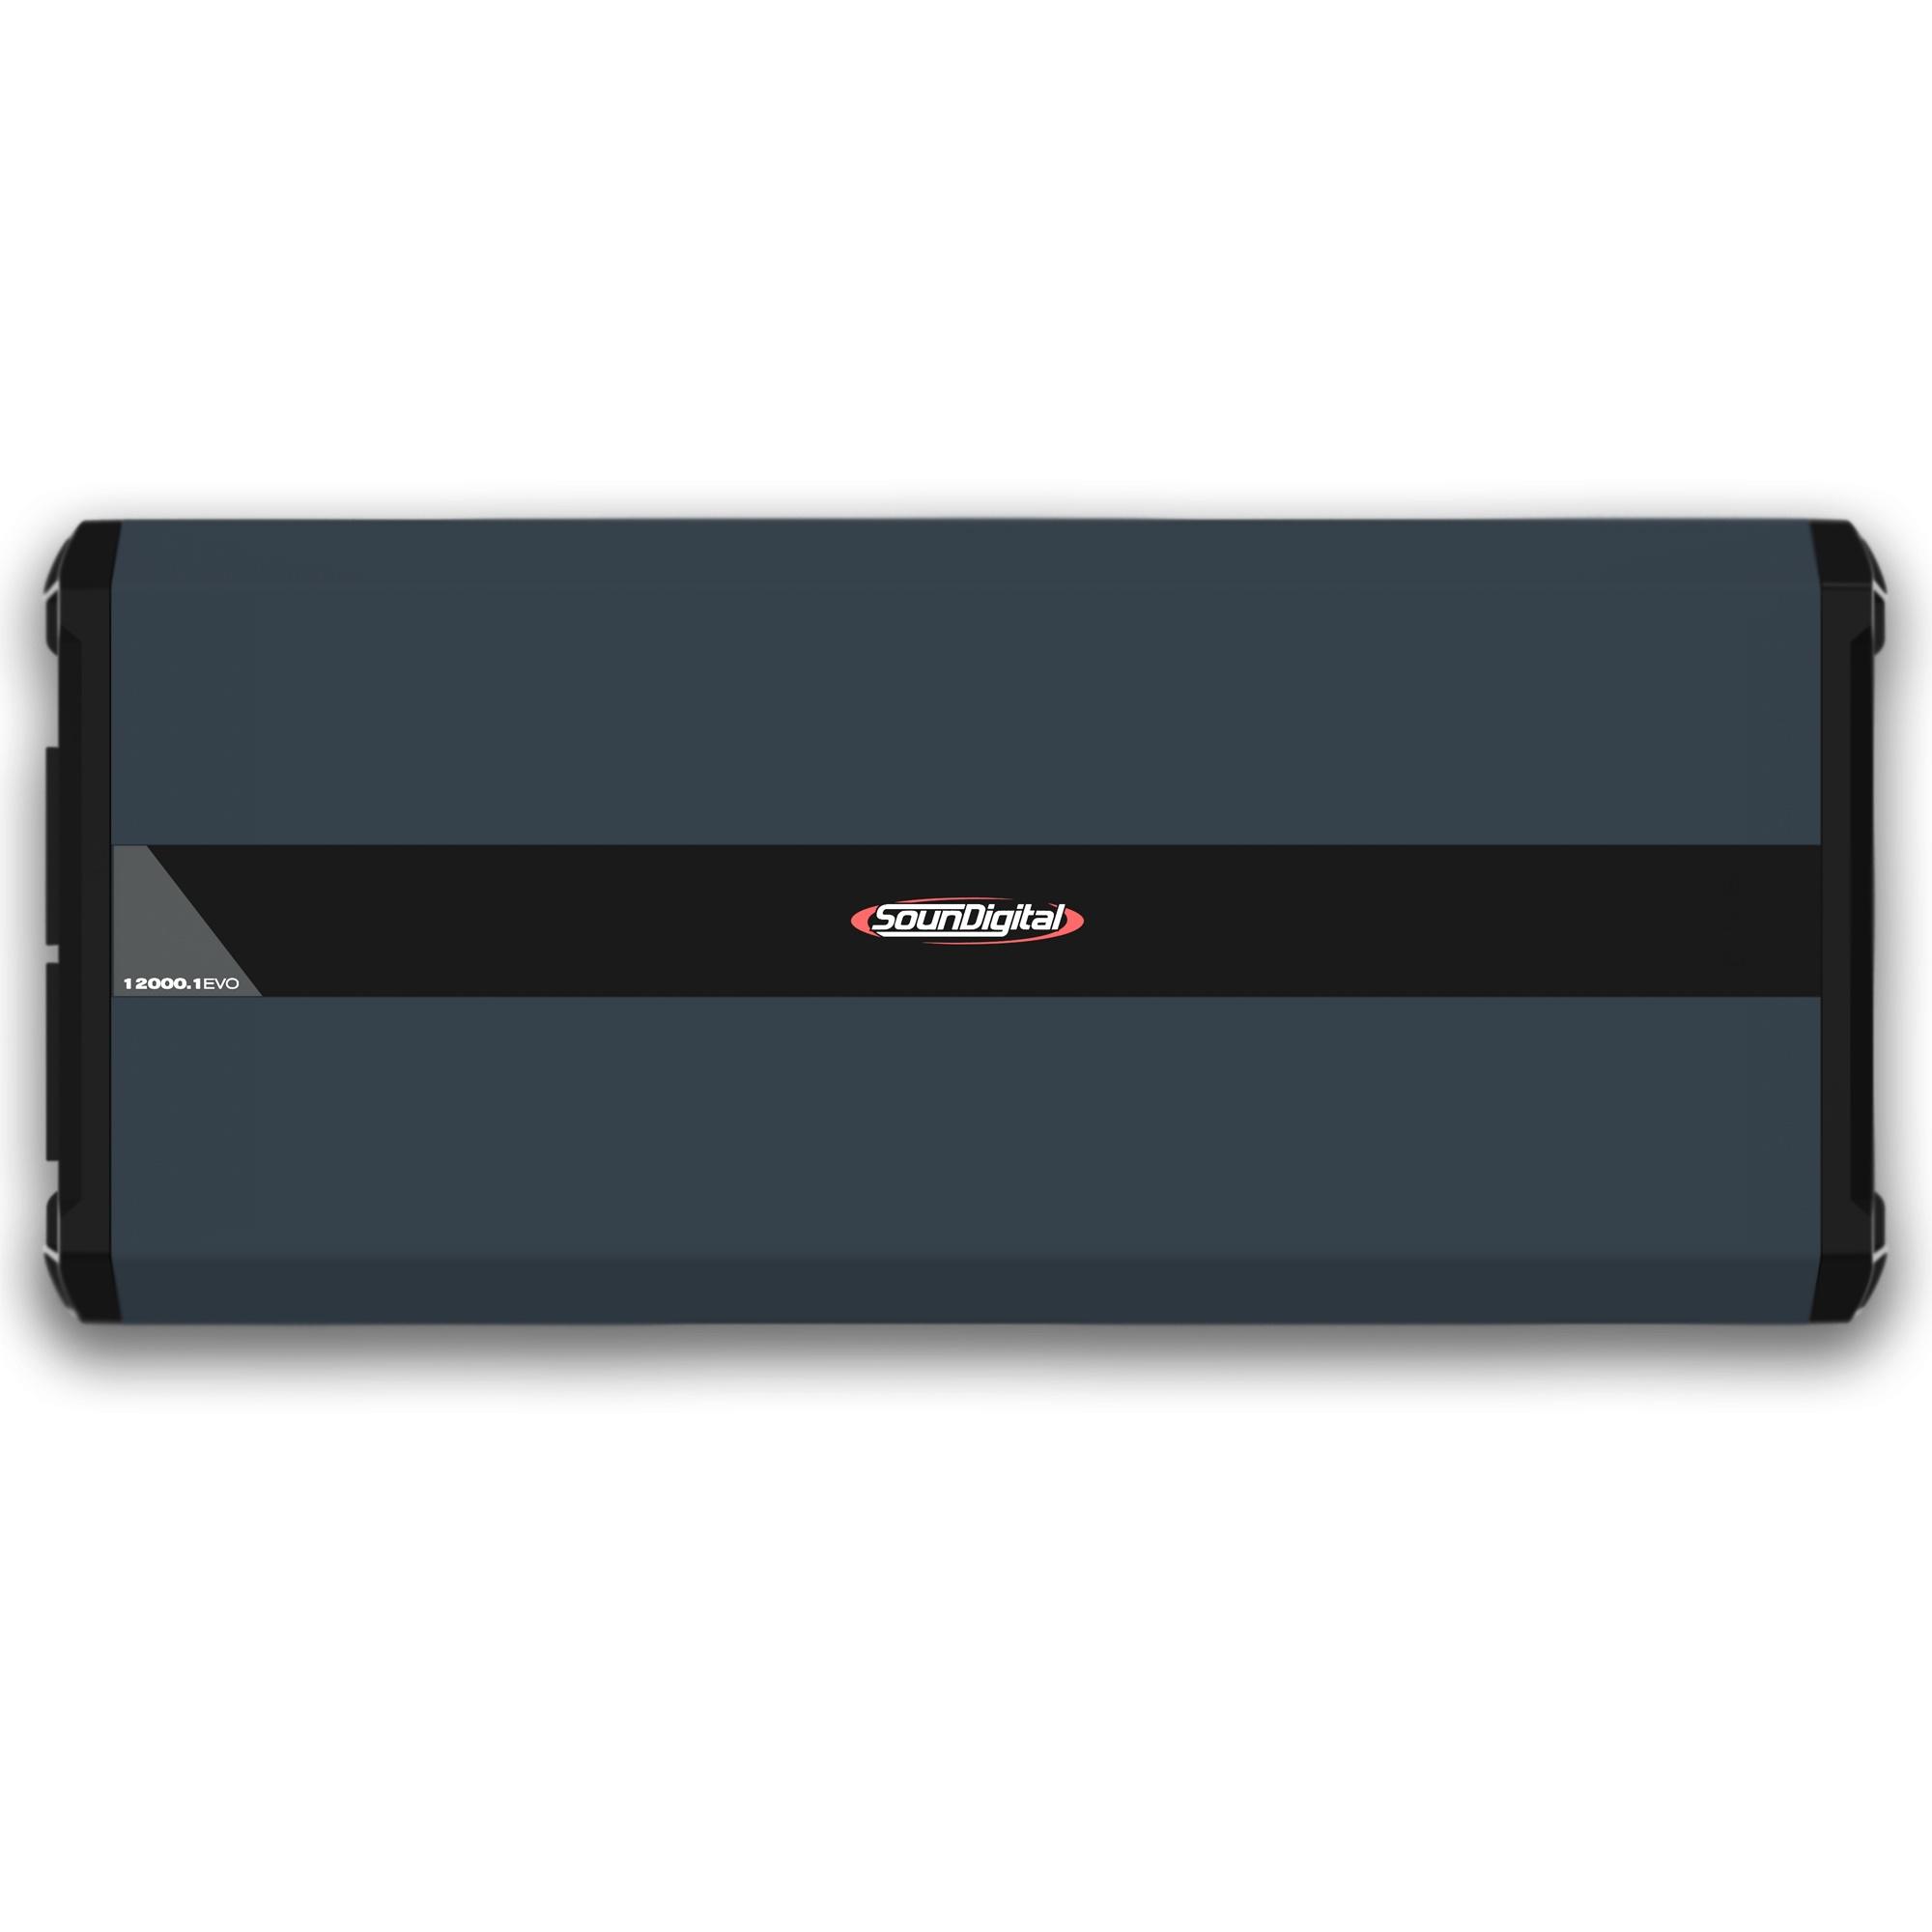 Módulo Amplificador Soundigital SD 12000.1 EVO 4.0 12000W Rms 2 Ohms 1 Canal